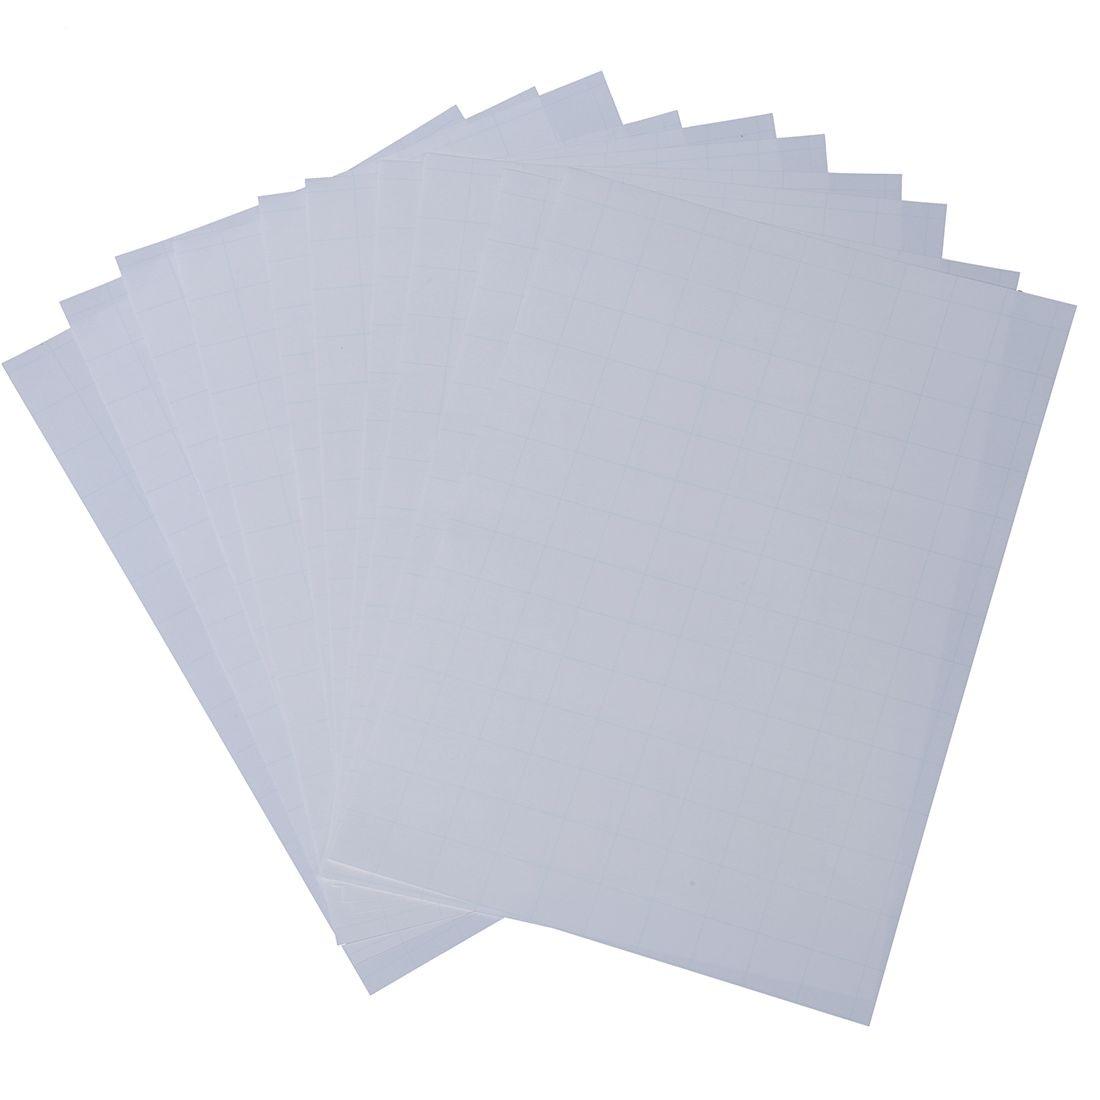 NEW 10 Sheets A4 Inkjet Transfer Paper Transfer Paper for T-Shirt